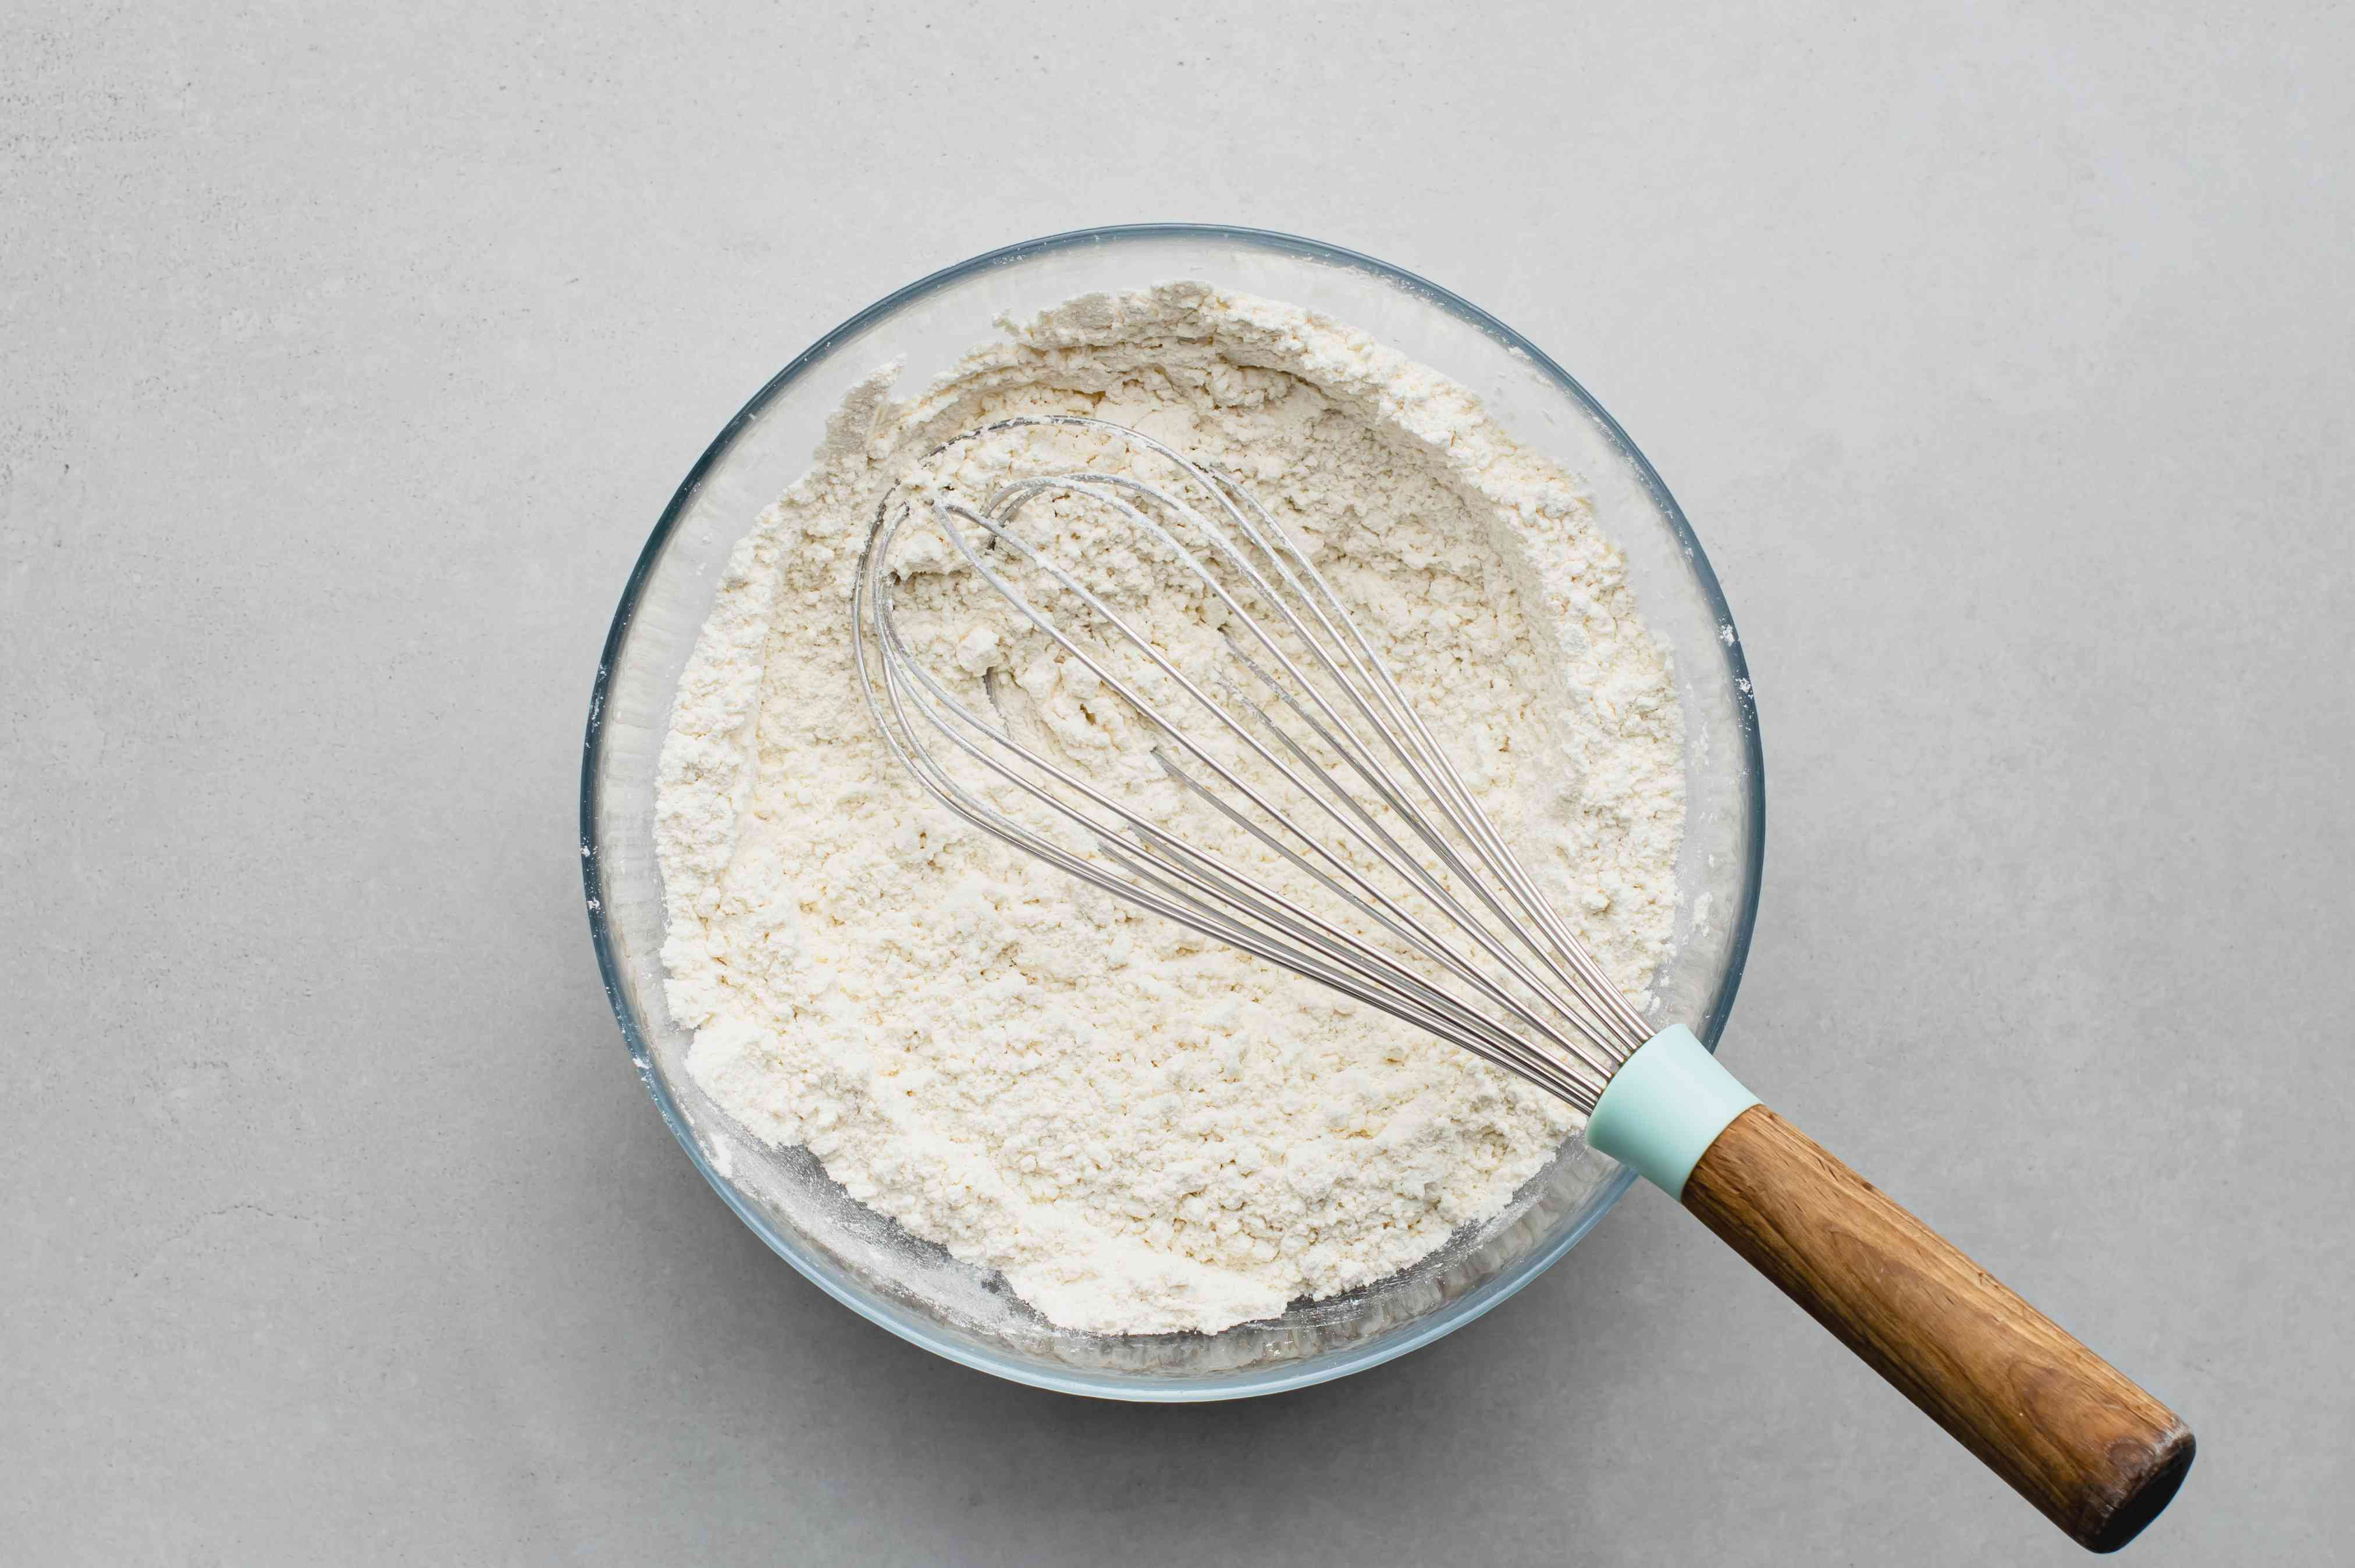 flour, salt, and baking soda in a bowl